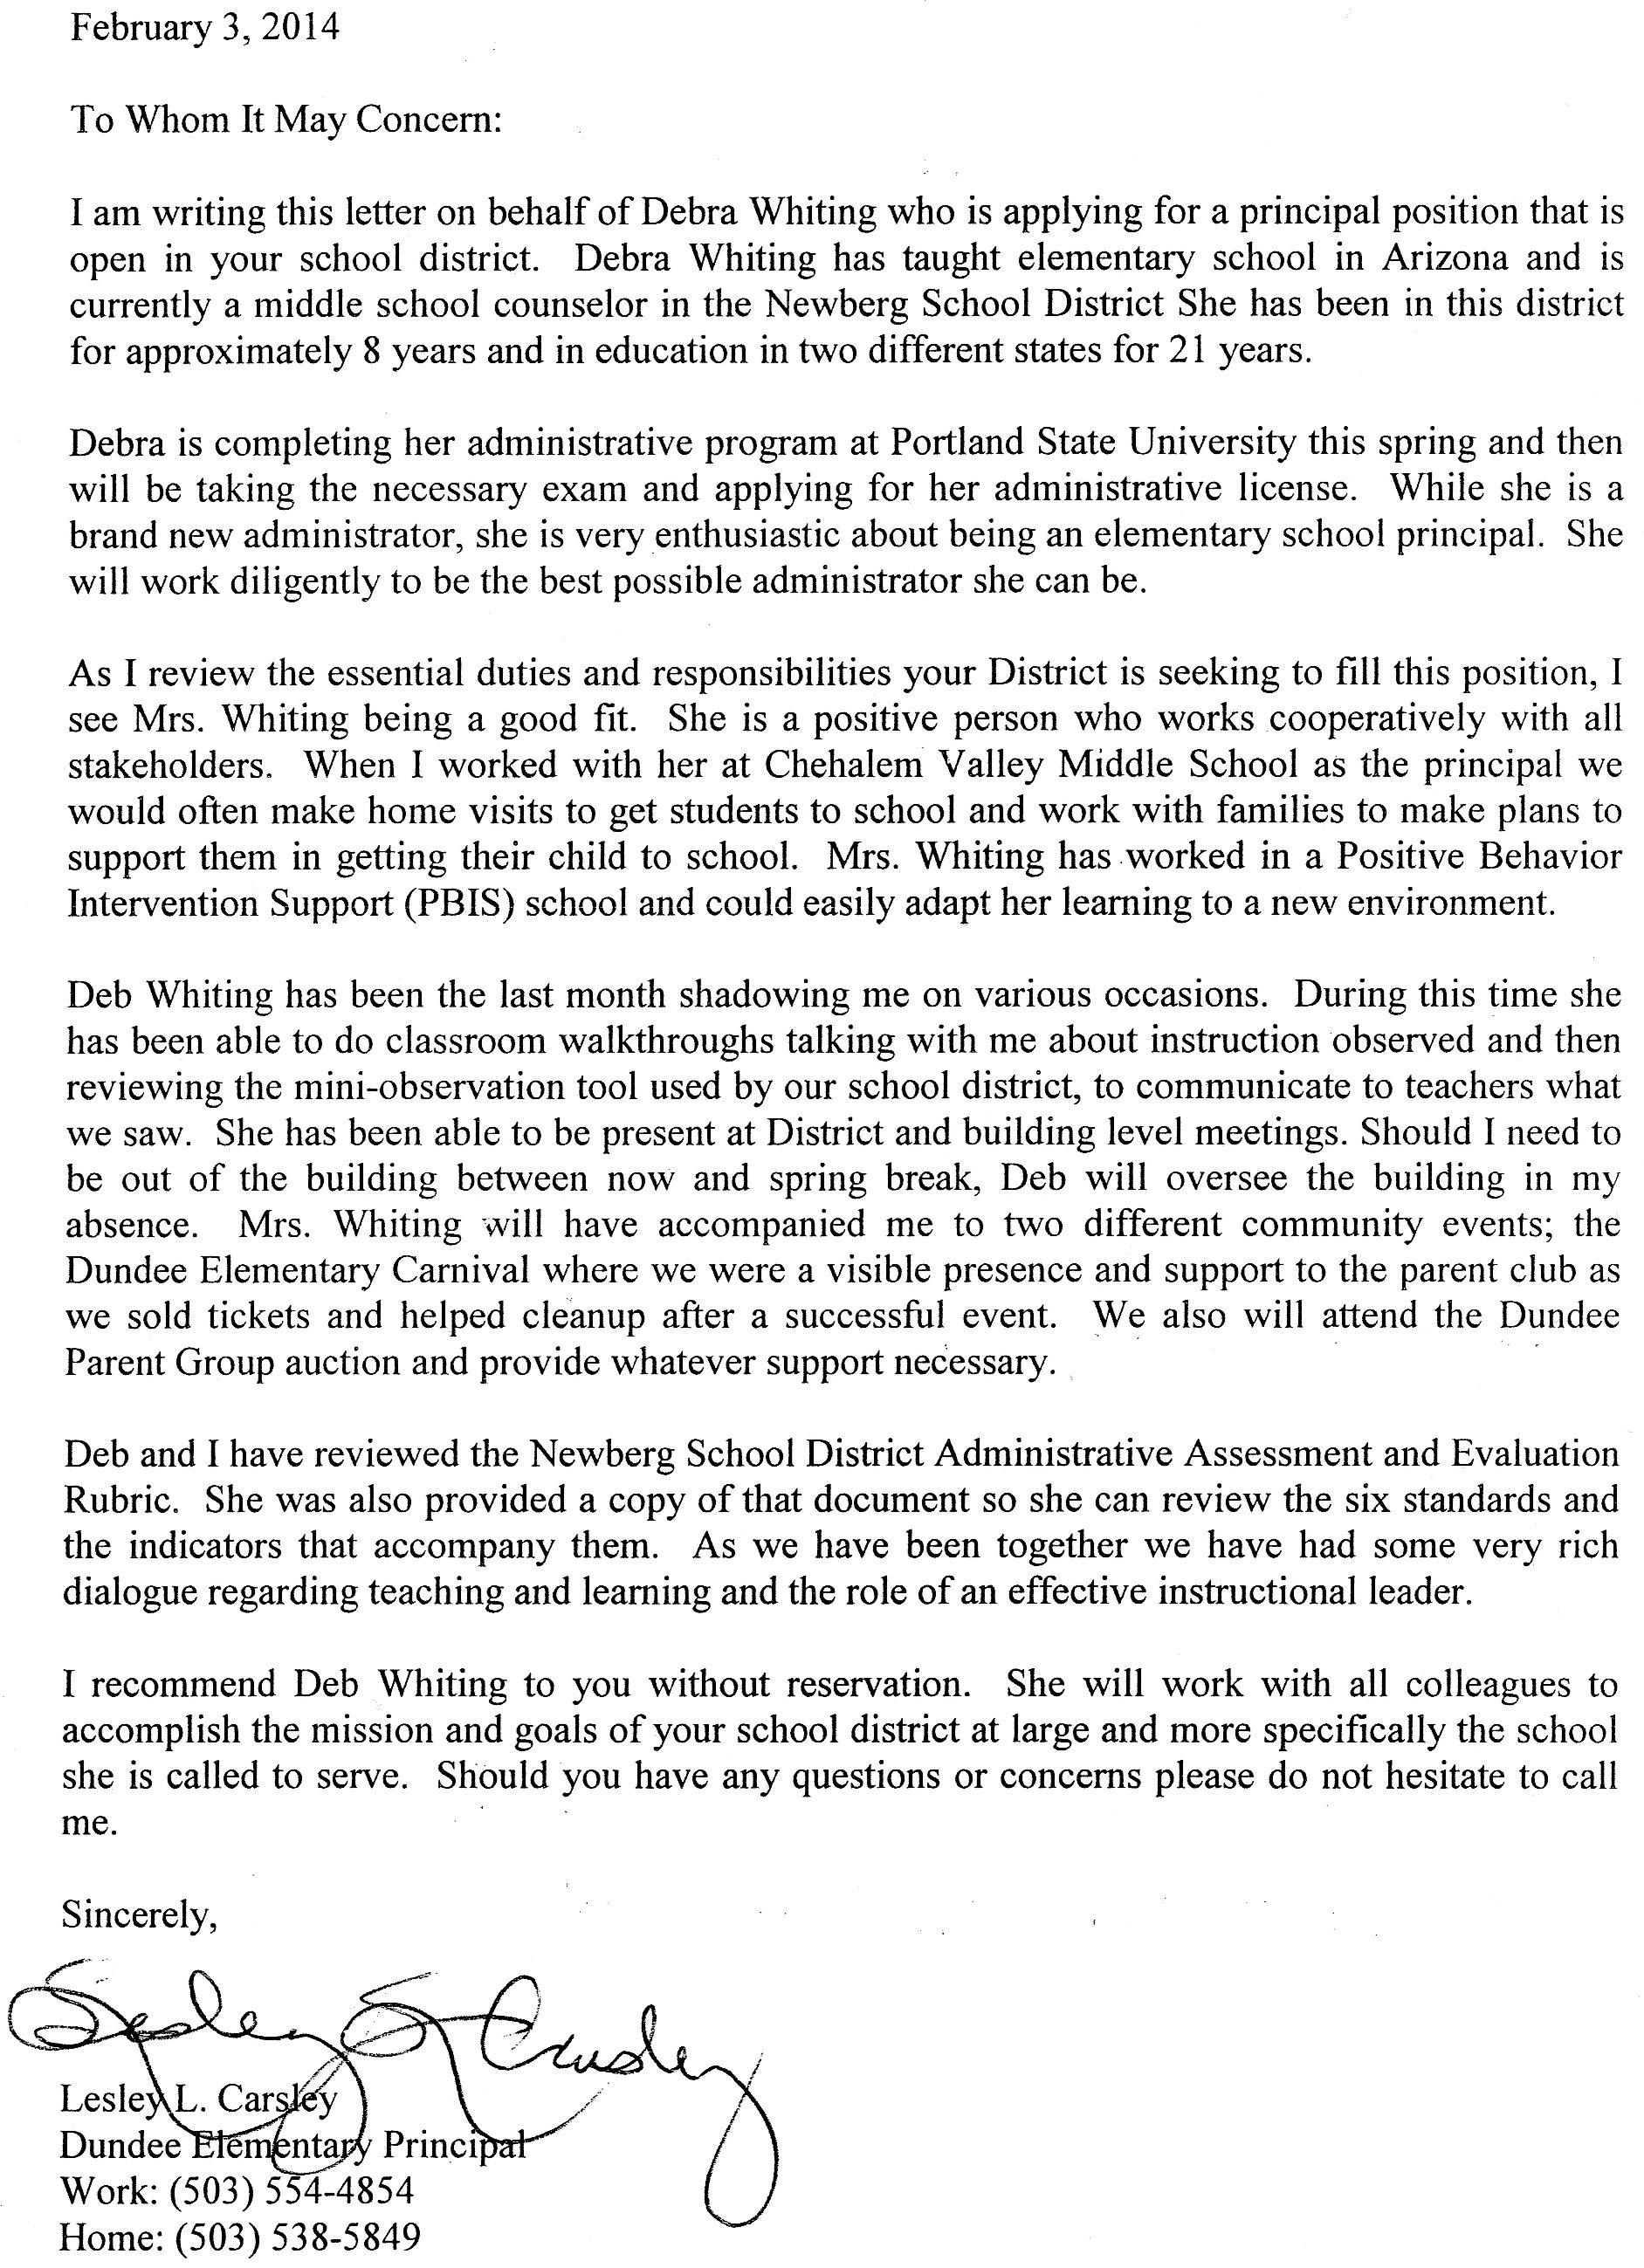 Reference Letter For School Principal Position   Best   Resume   Samples